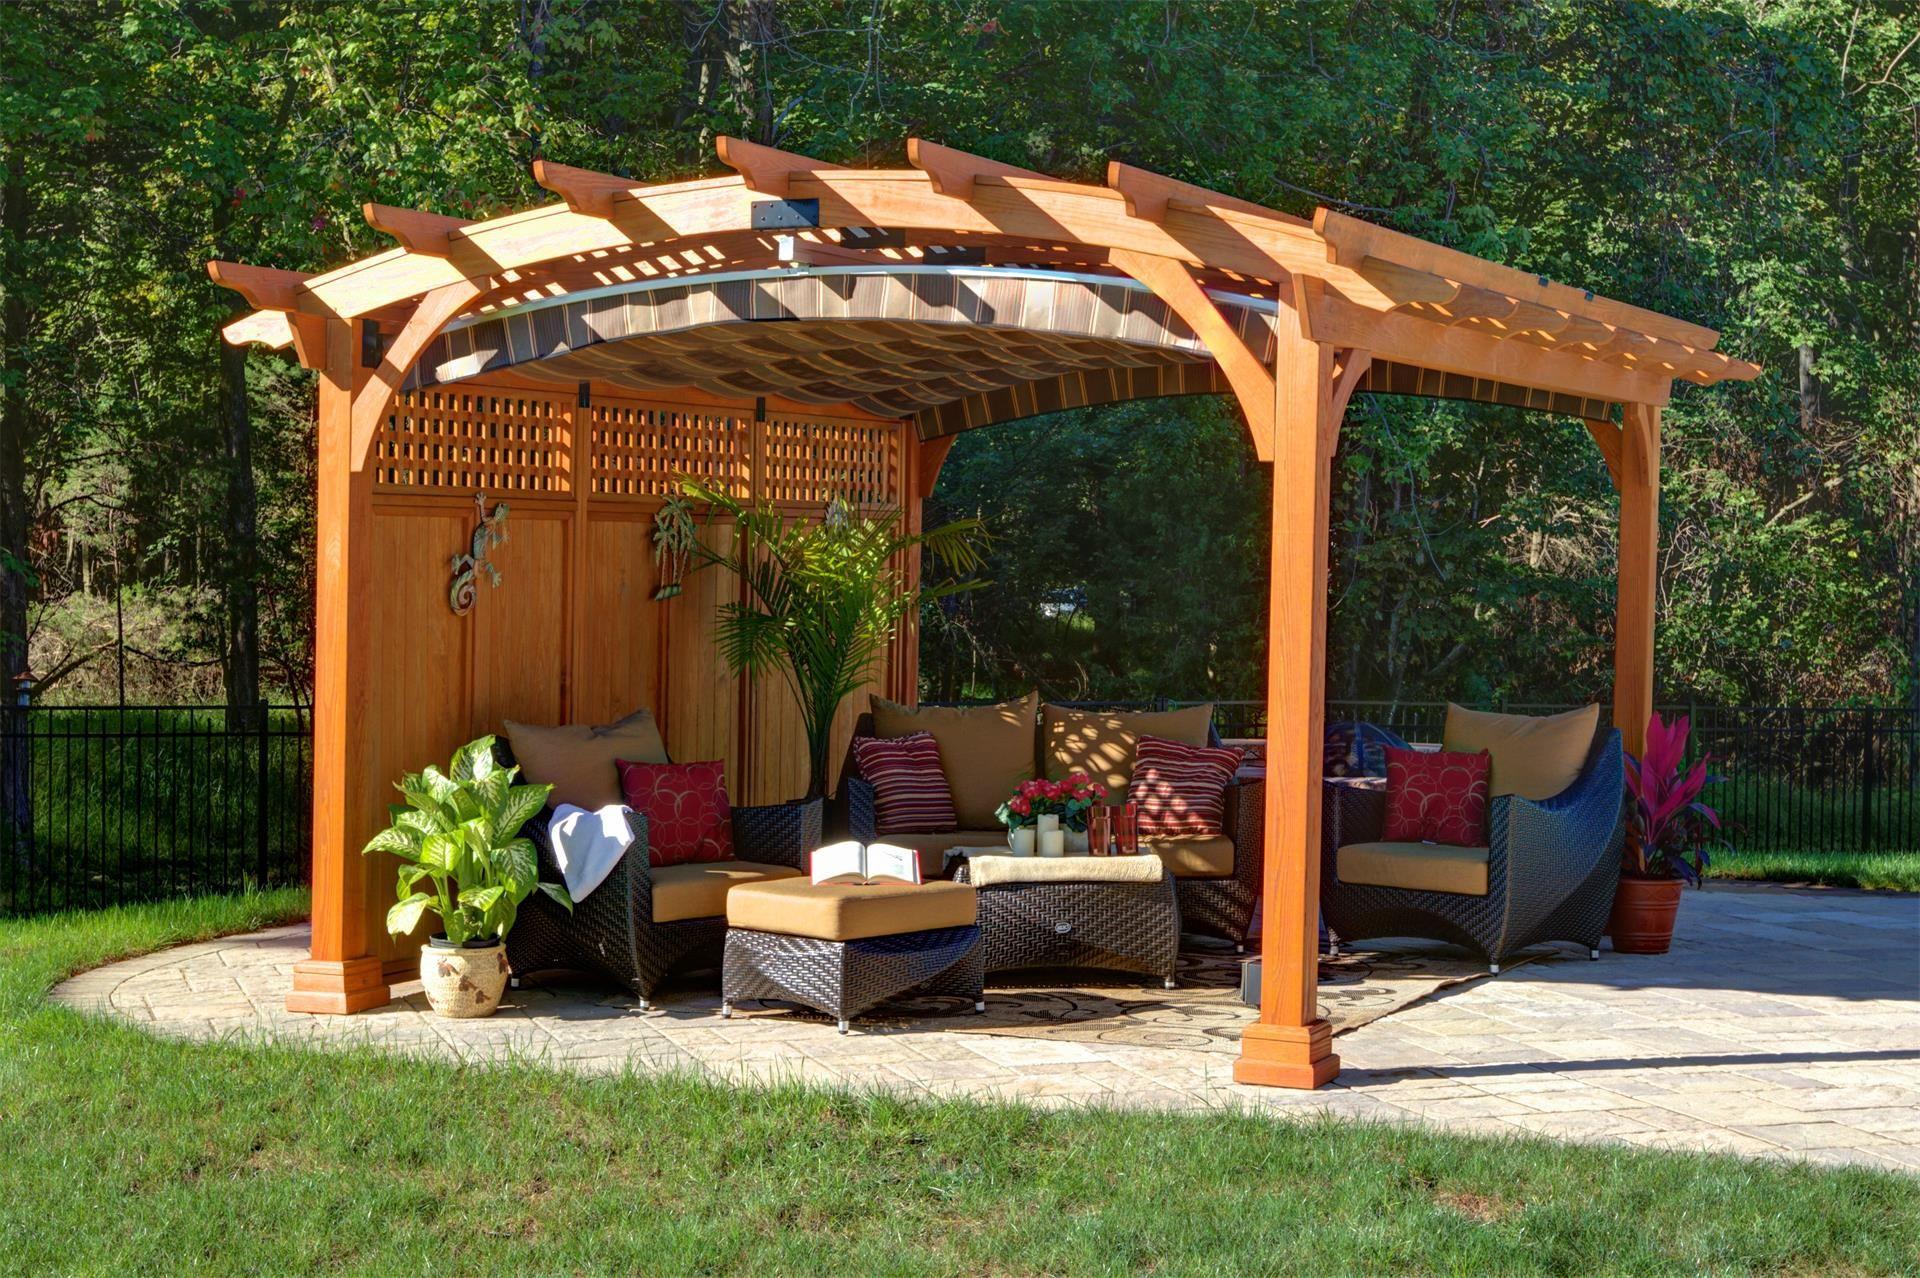 Voile Ombrage Pergola Bois amish hearthside pine pergola kit | pergola patio, outdoor